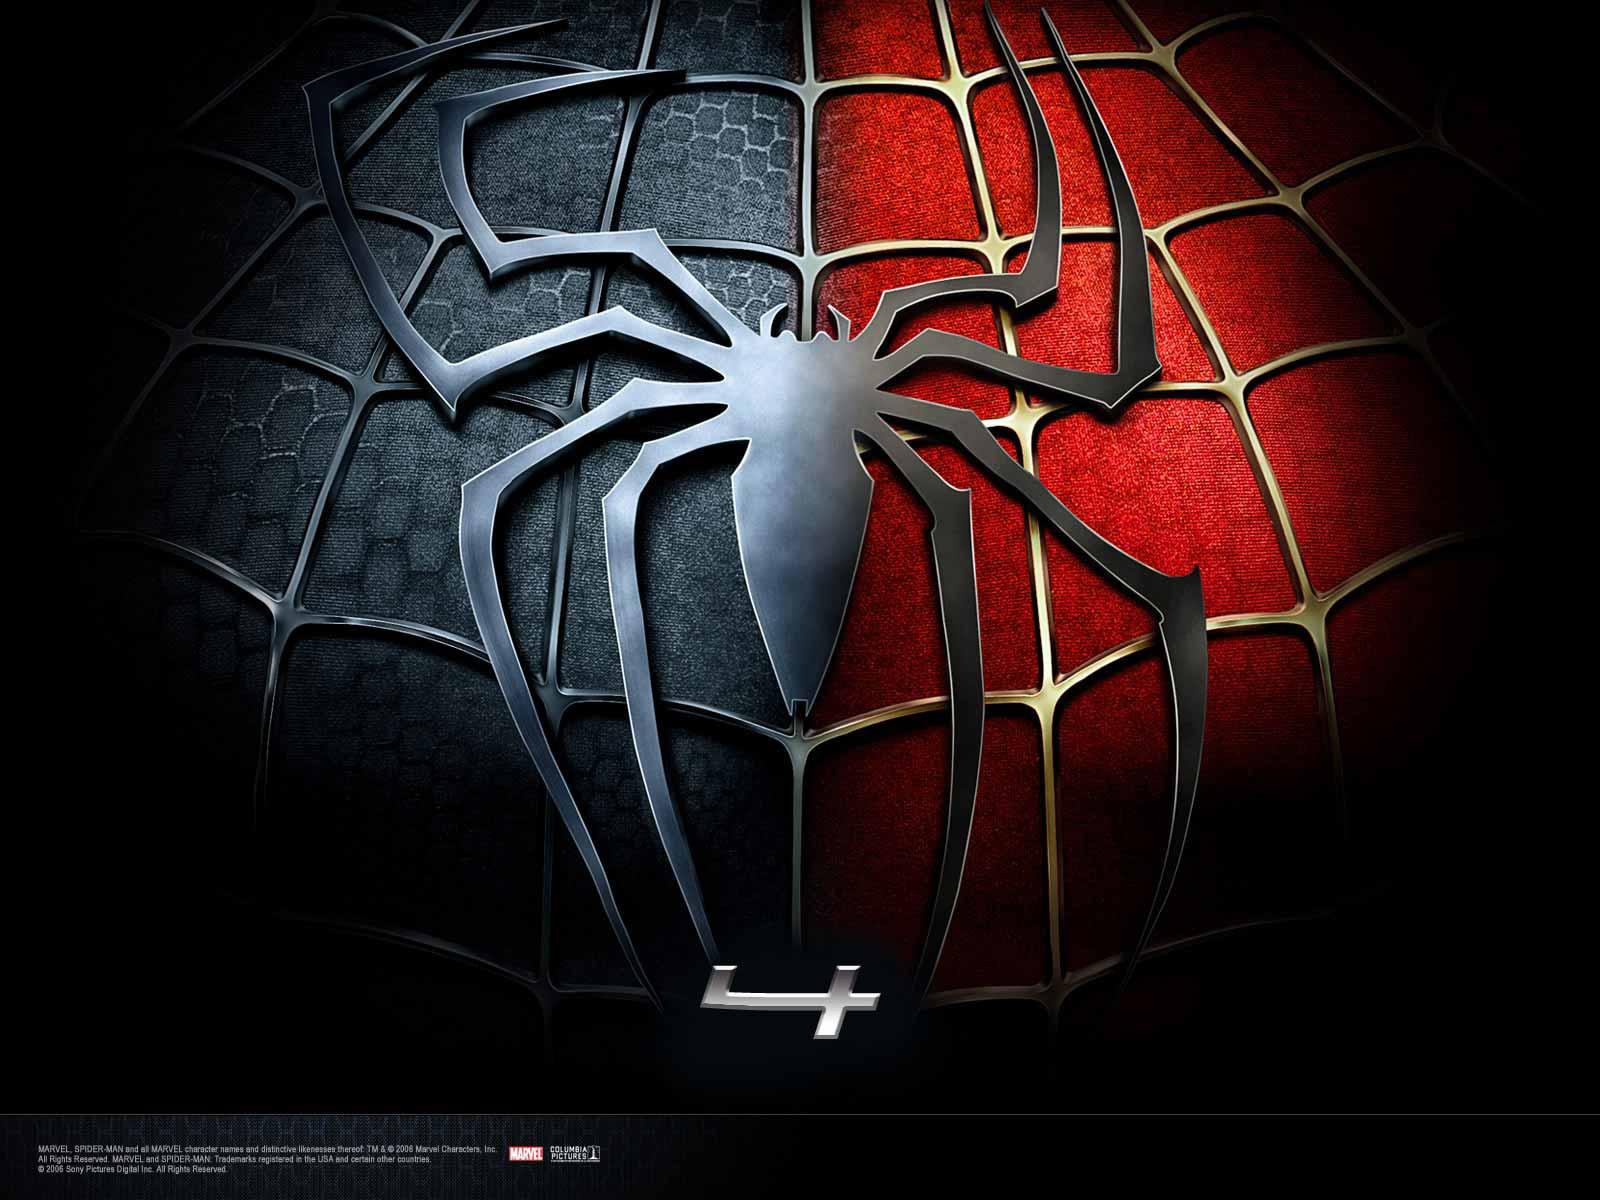 Spiderman 4 Wallpaper HD Wallpapers Download Free Images Wallpaper [1000image.com]